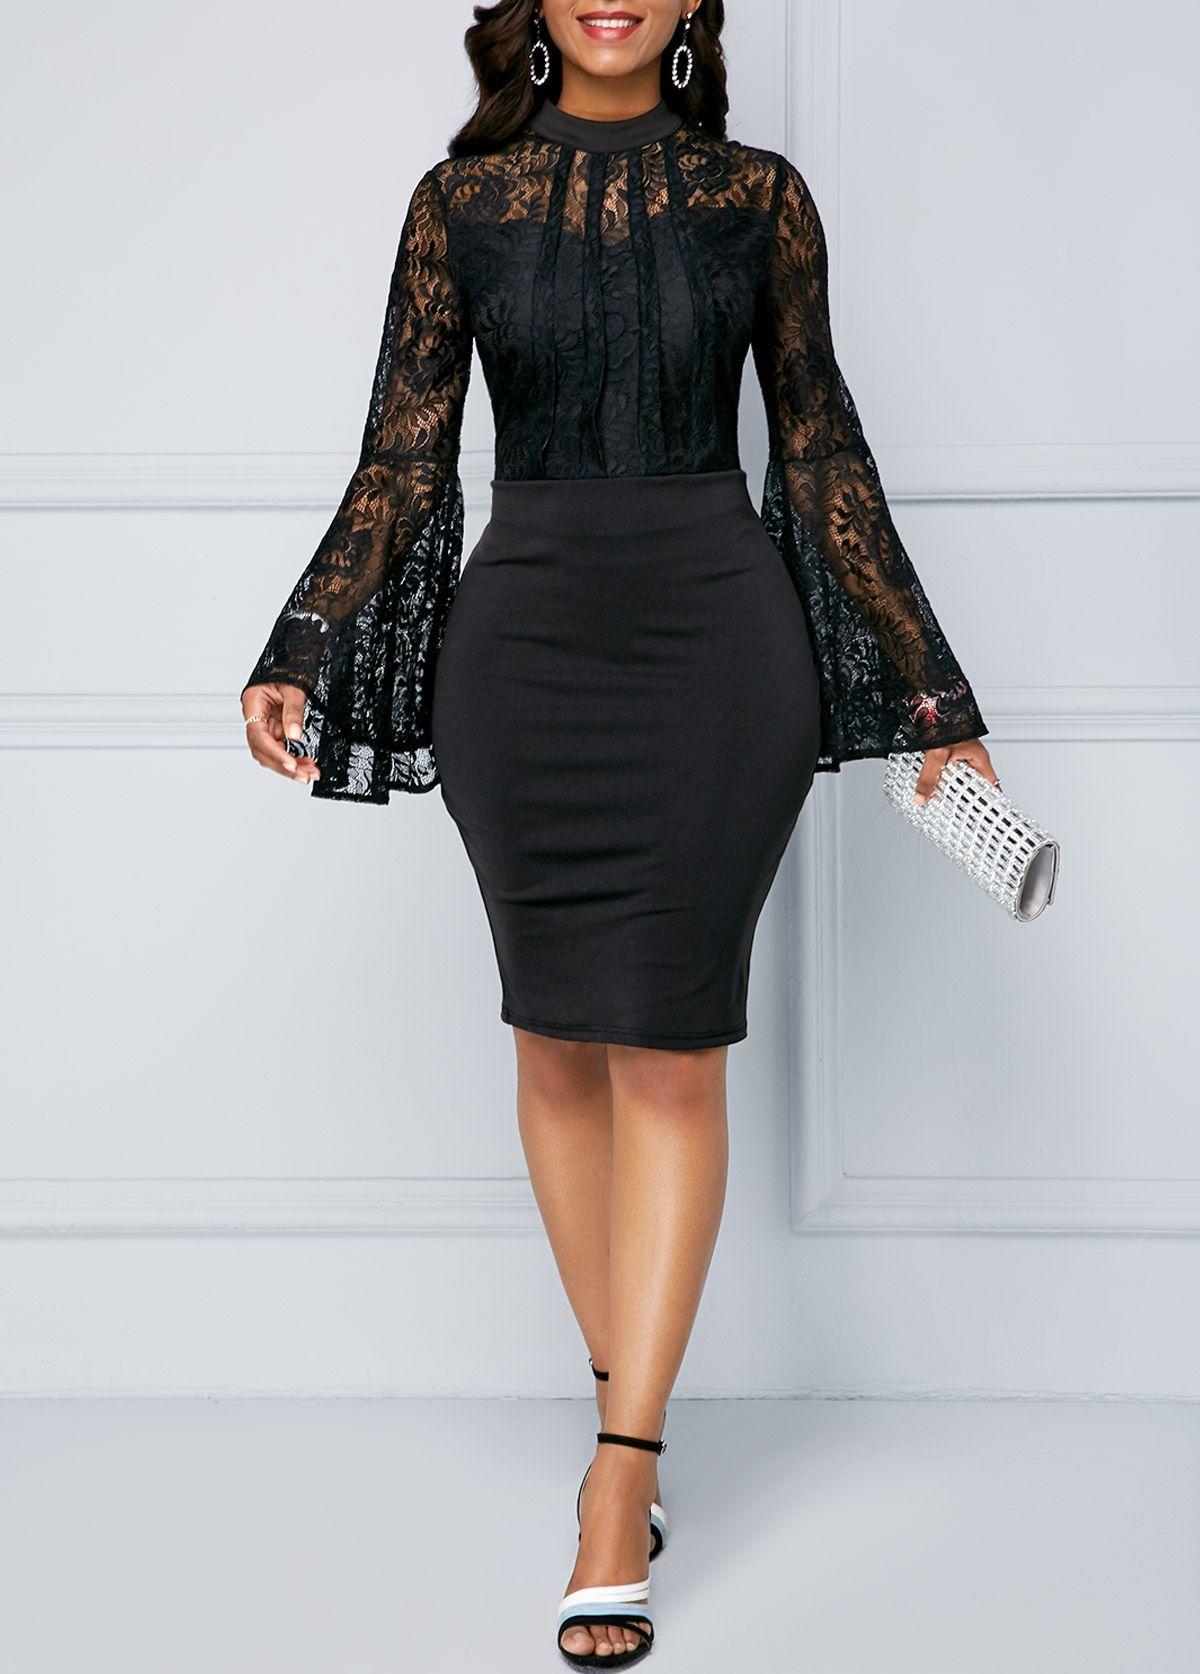 db60908afab Lace Panel Black Scoop Neck Sheath Dress liligal dresses